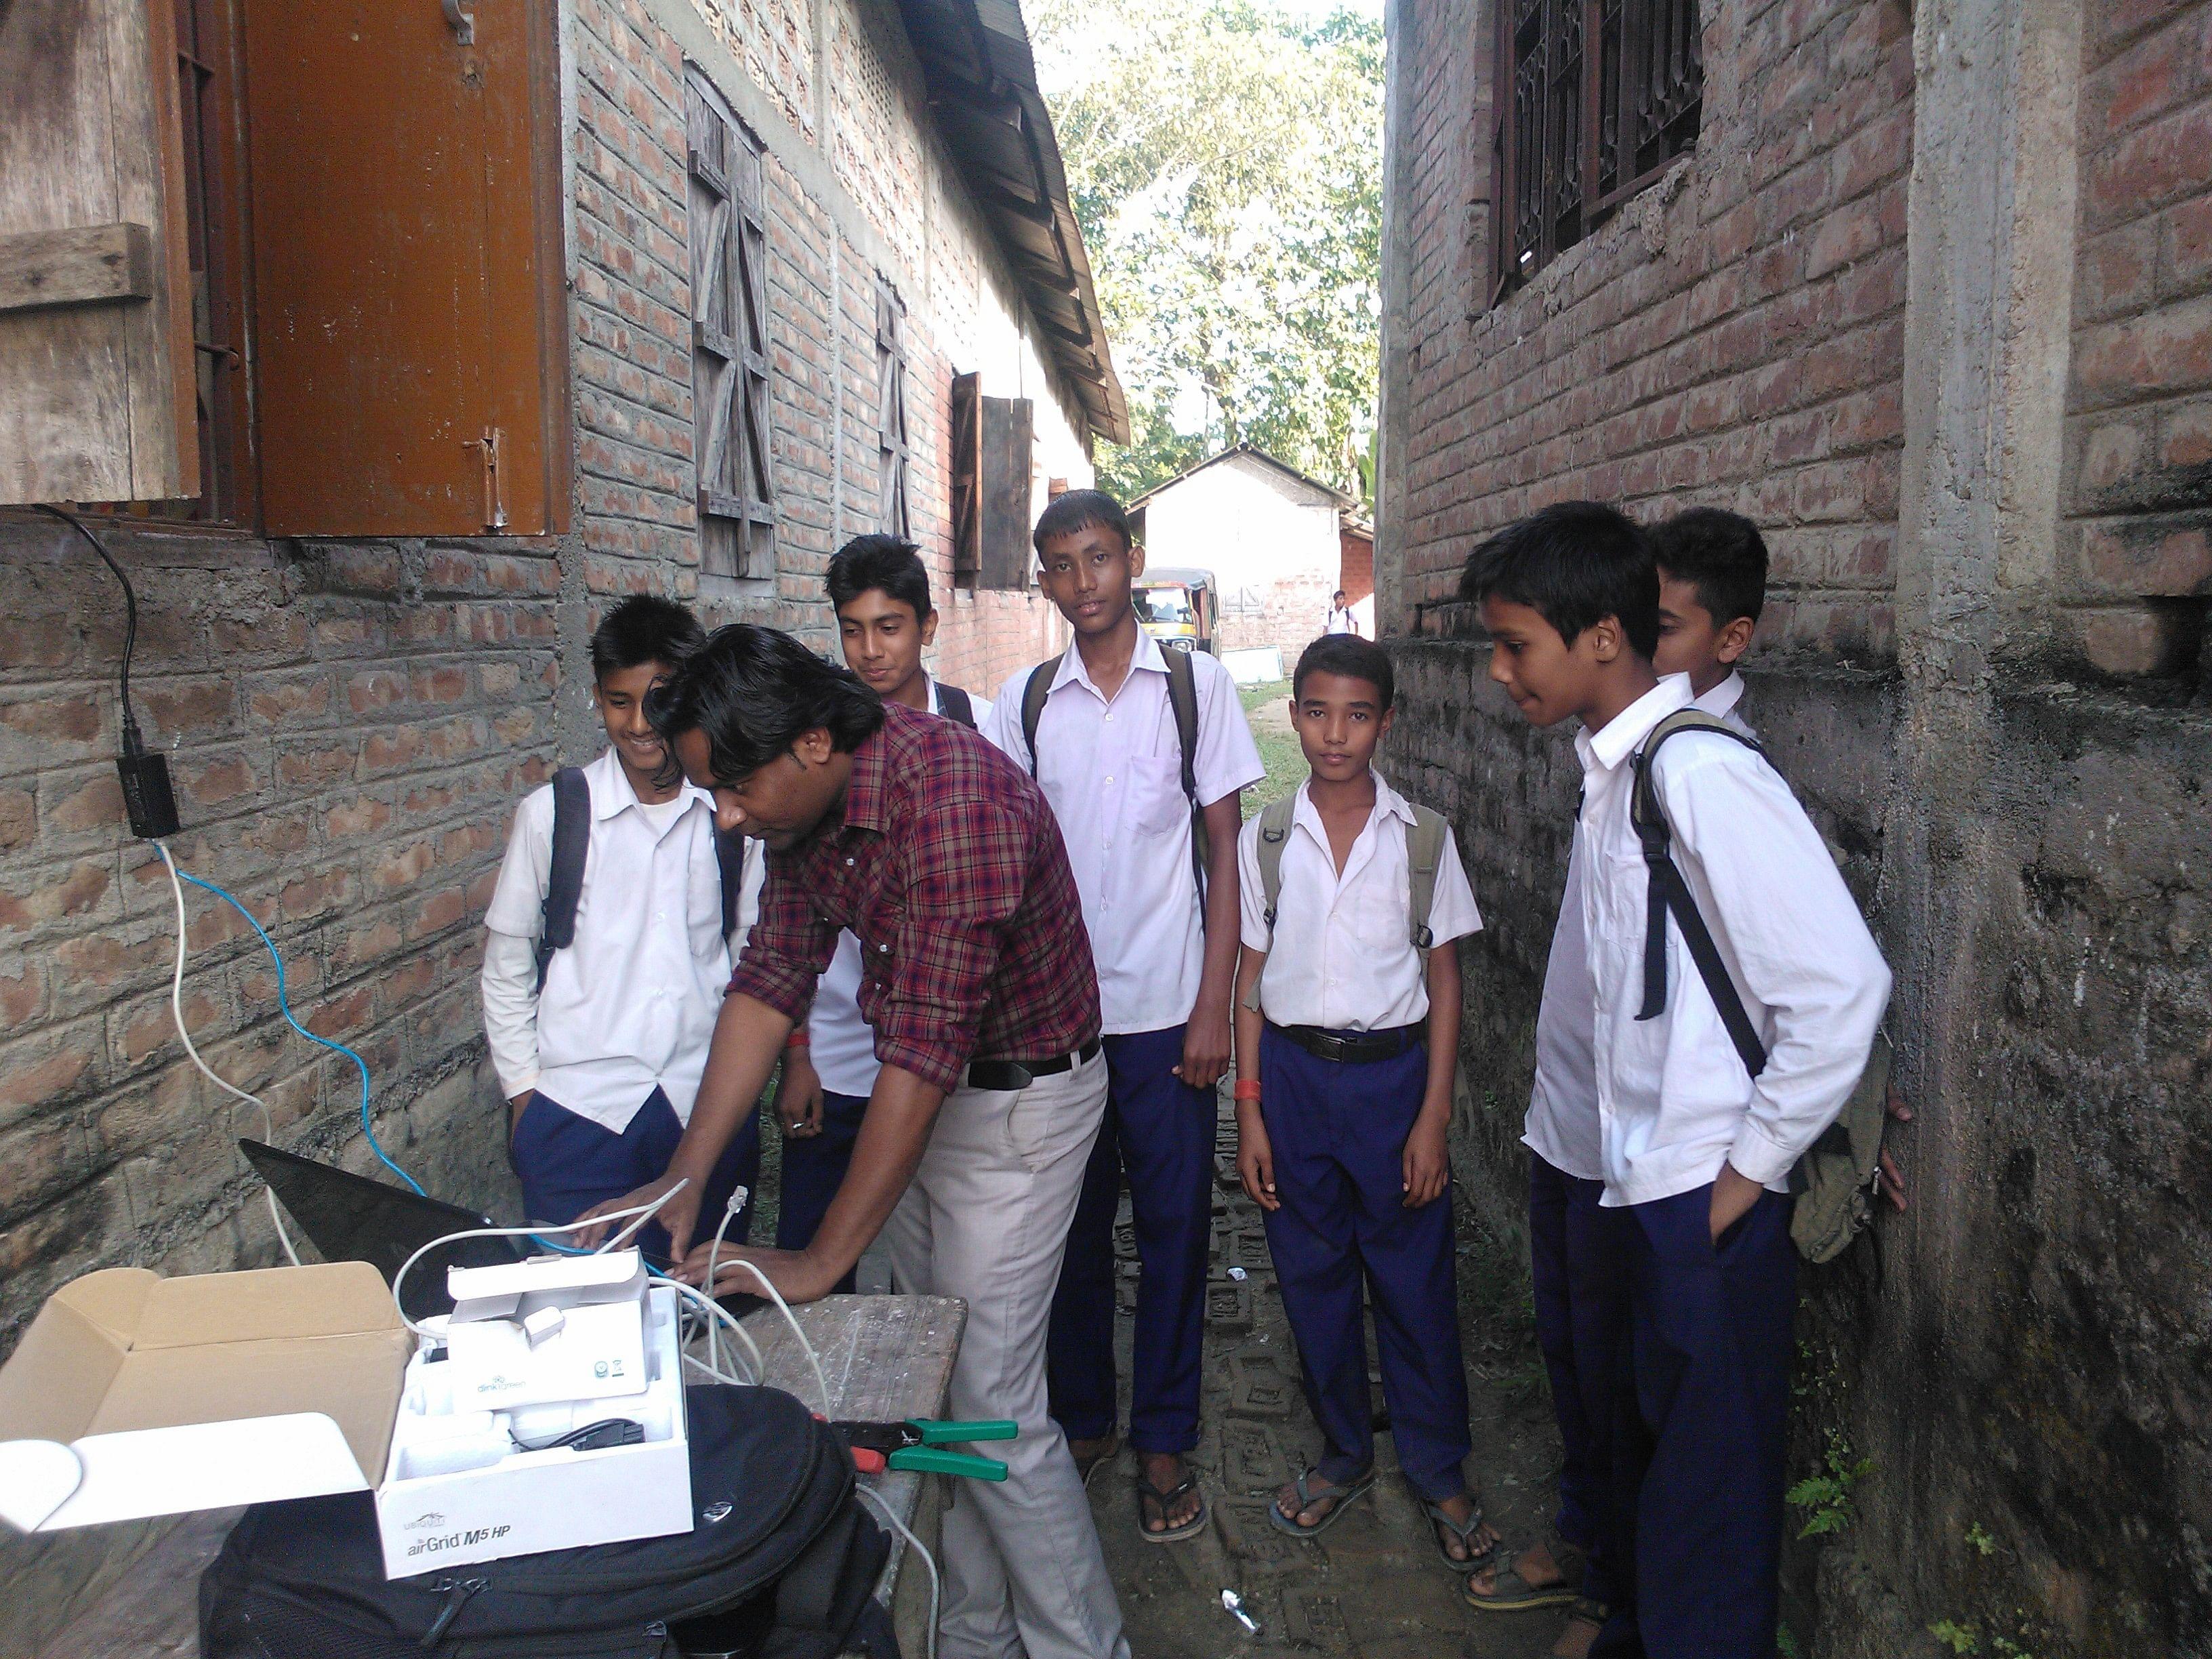 Mudassir teaching computing to rural school children